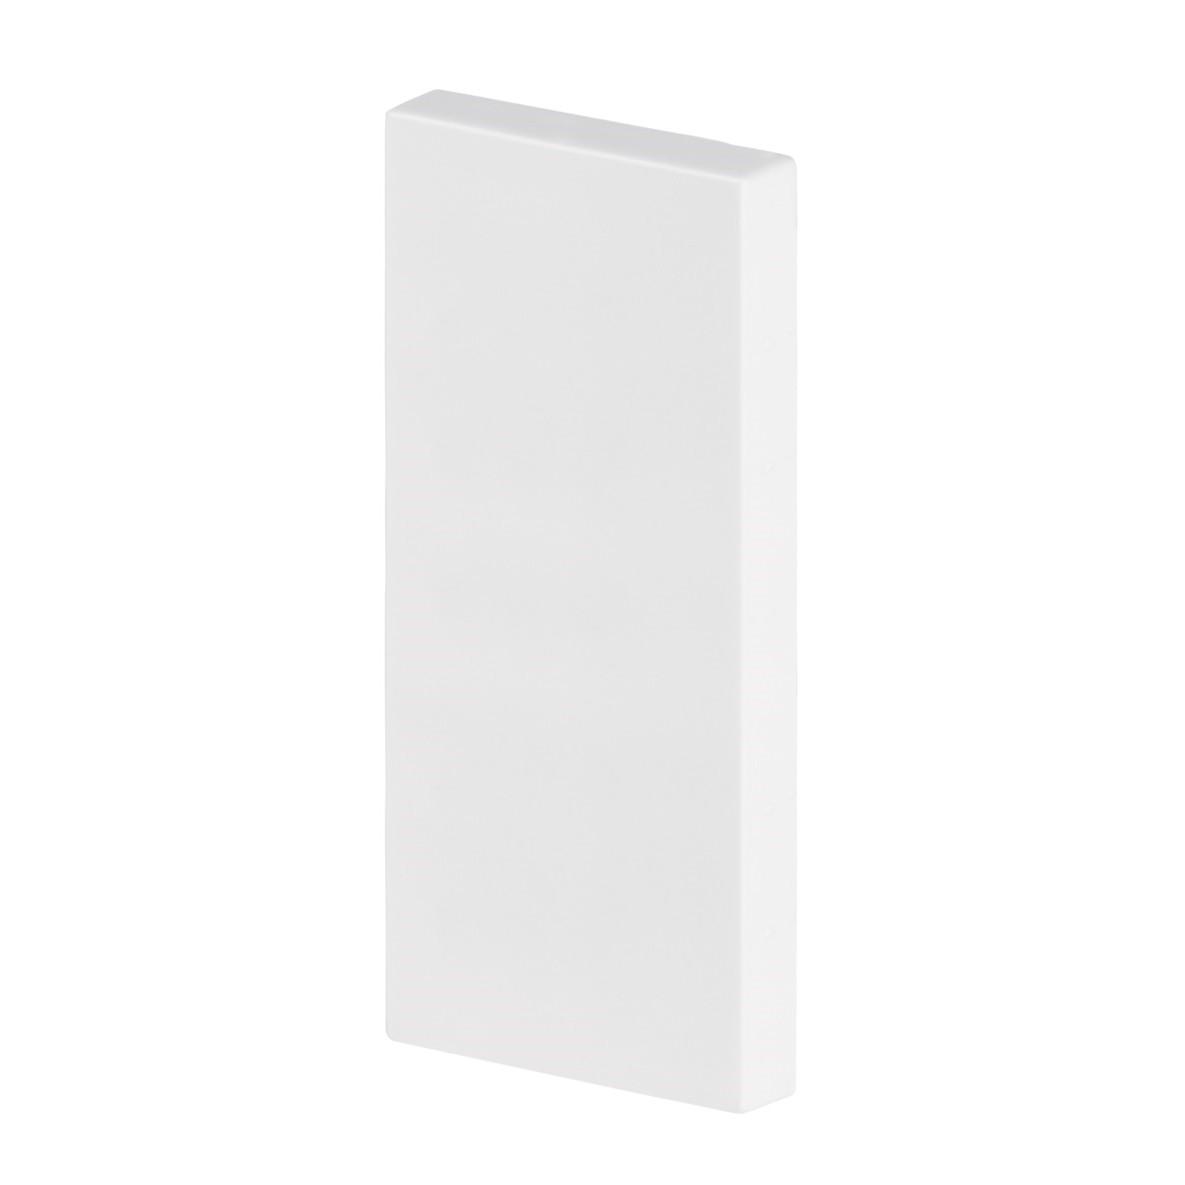 Rodape 24 x 1700 cm Poliestireno Branco - Arquitech